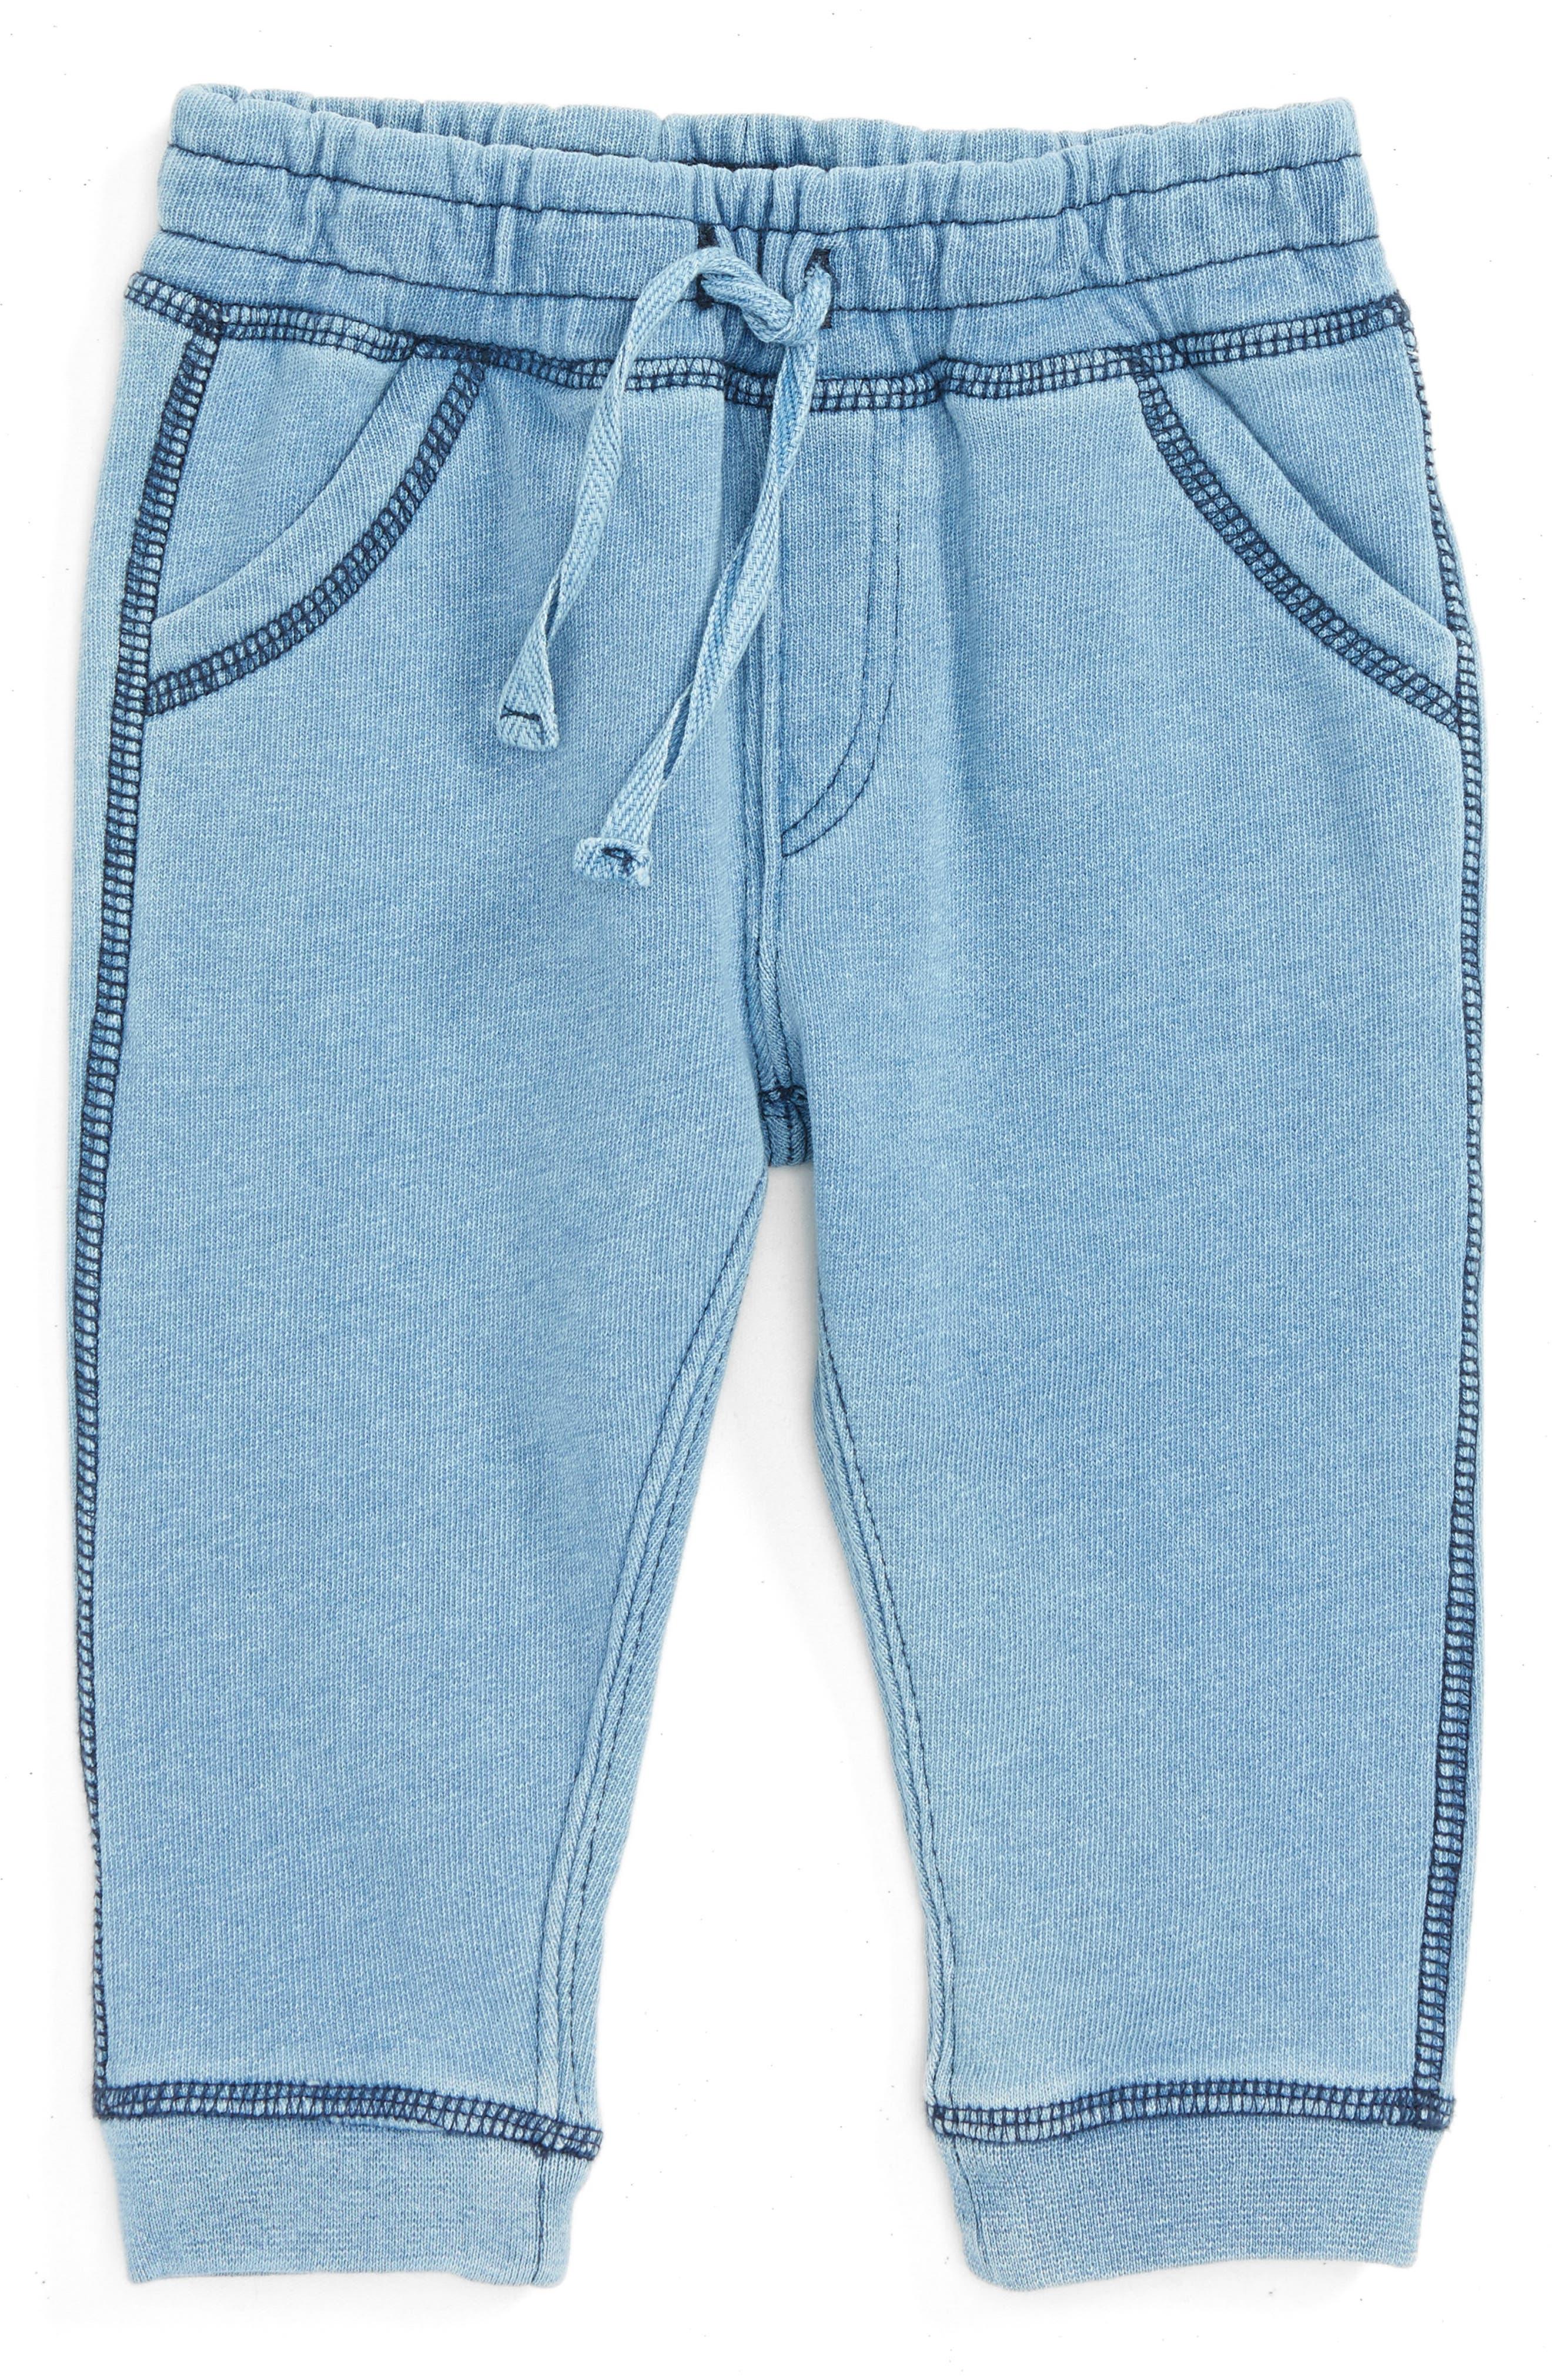 Tucker + Tate Knit Denim Pants (Baby)